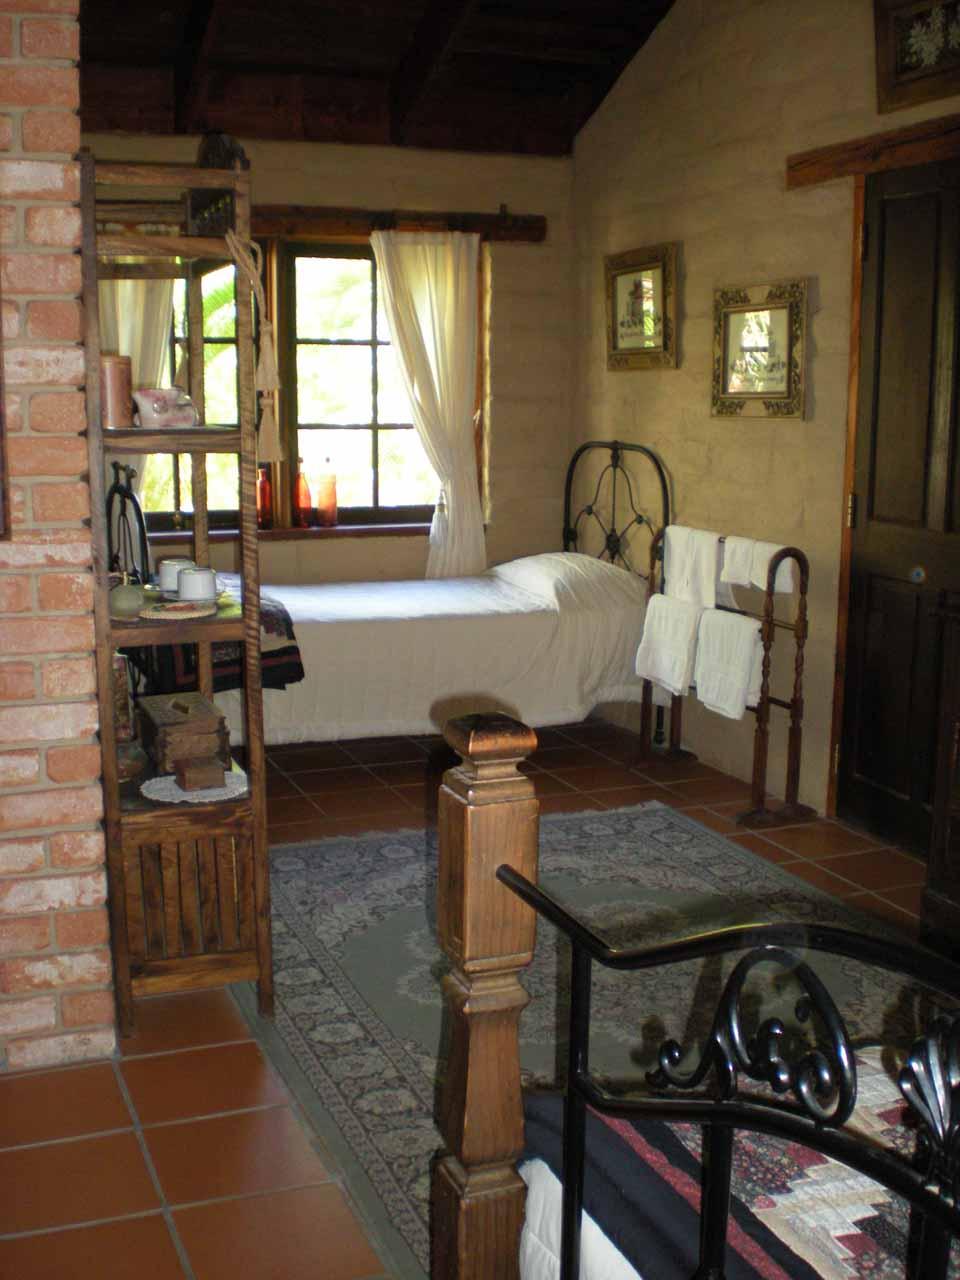 Room 2 at the Mudbrick Manor